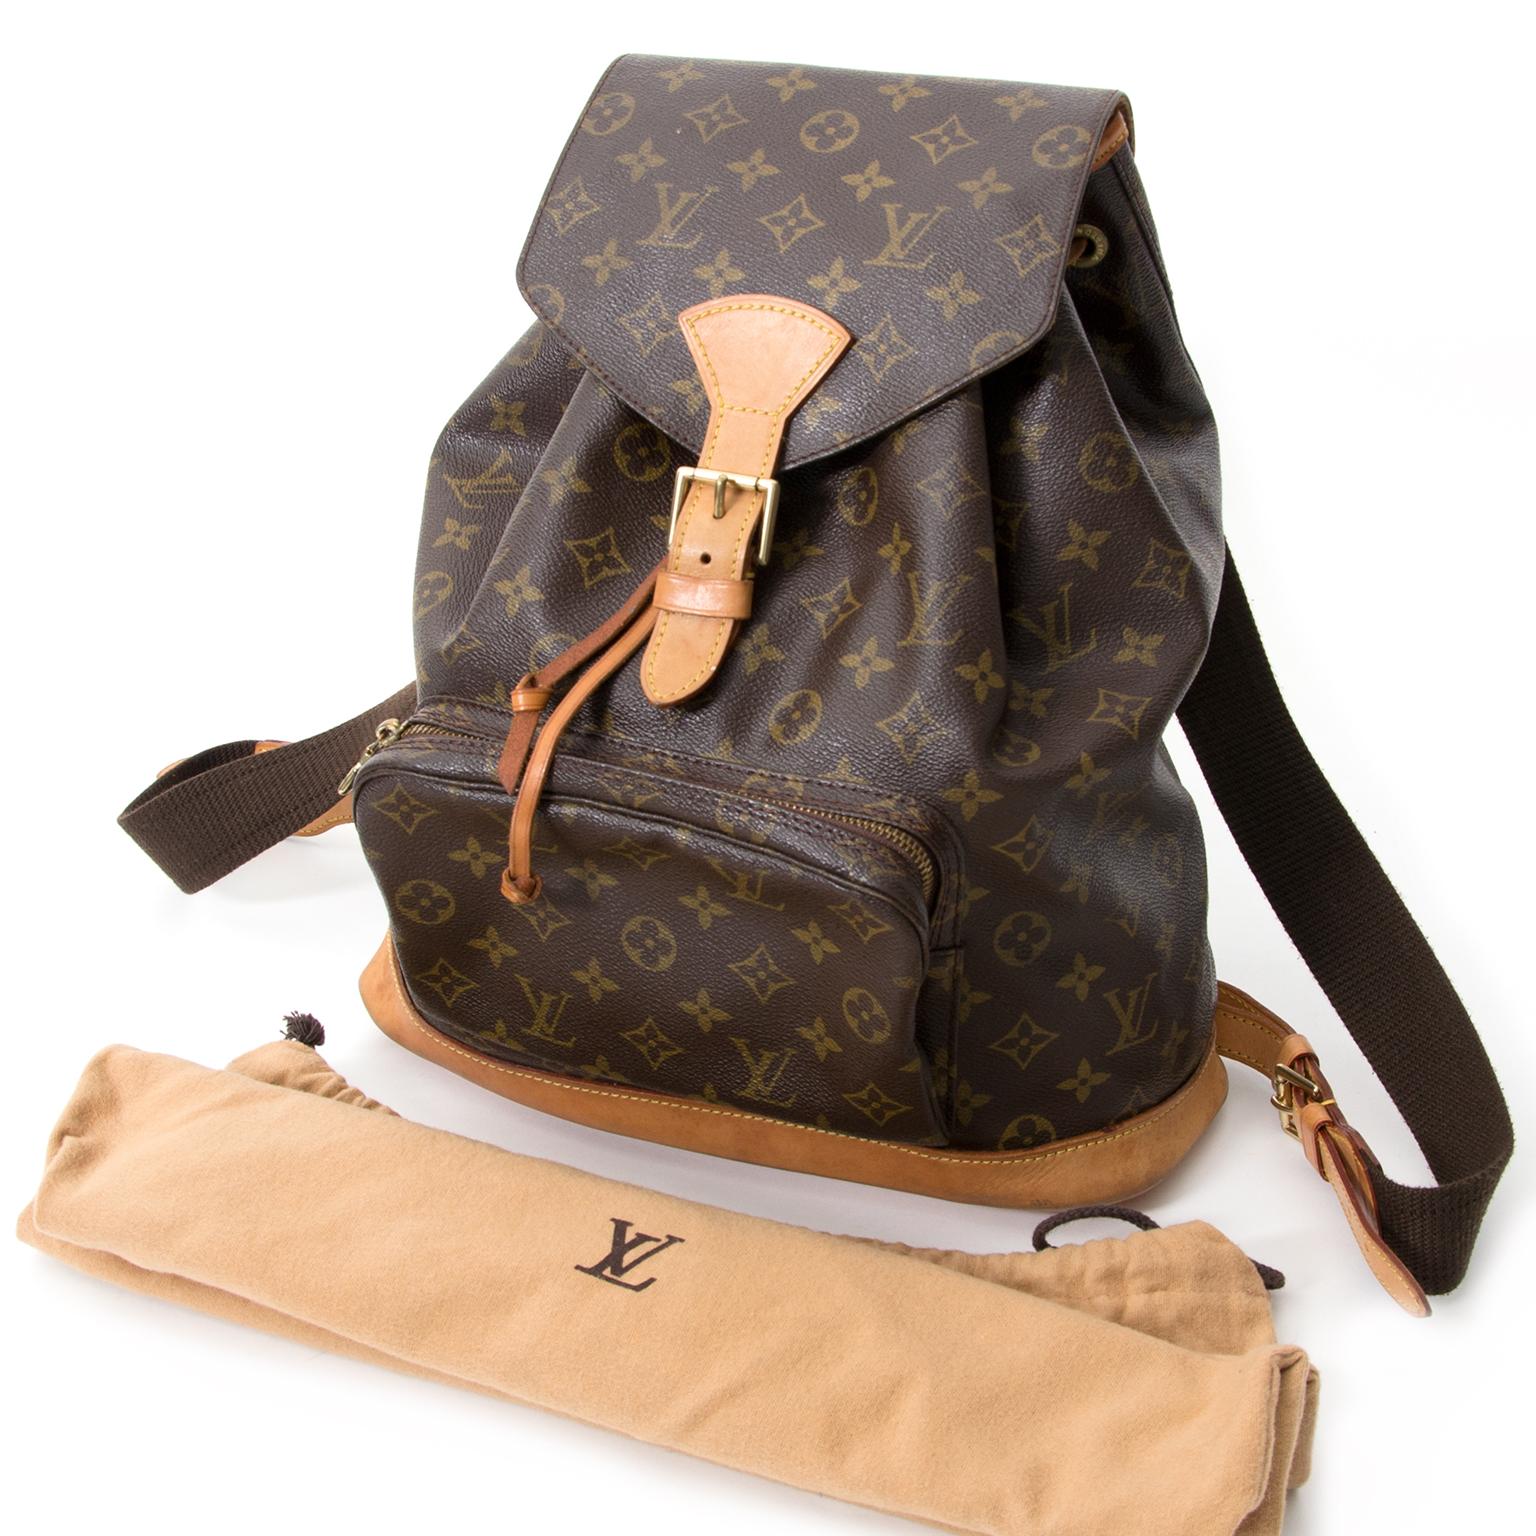 4ec73cdbdba5 ... buy safe online secondhand Louis Vuitton Monogram Backpack best price  like new